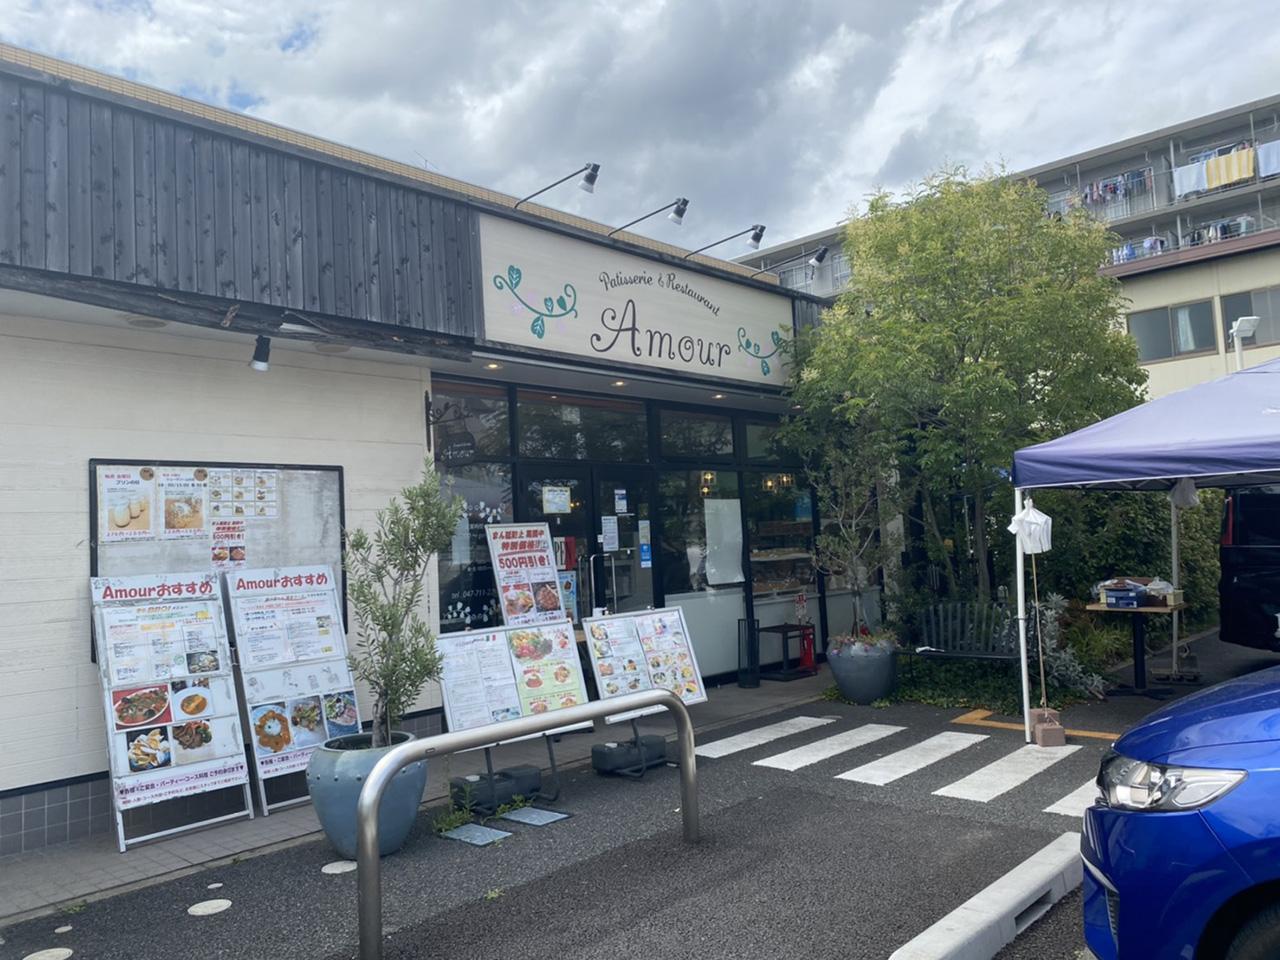 Patisserie &Restaurant Amour 原木中山店の外観